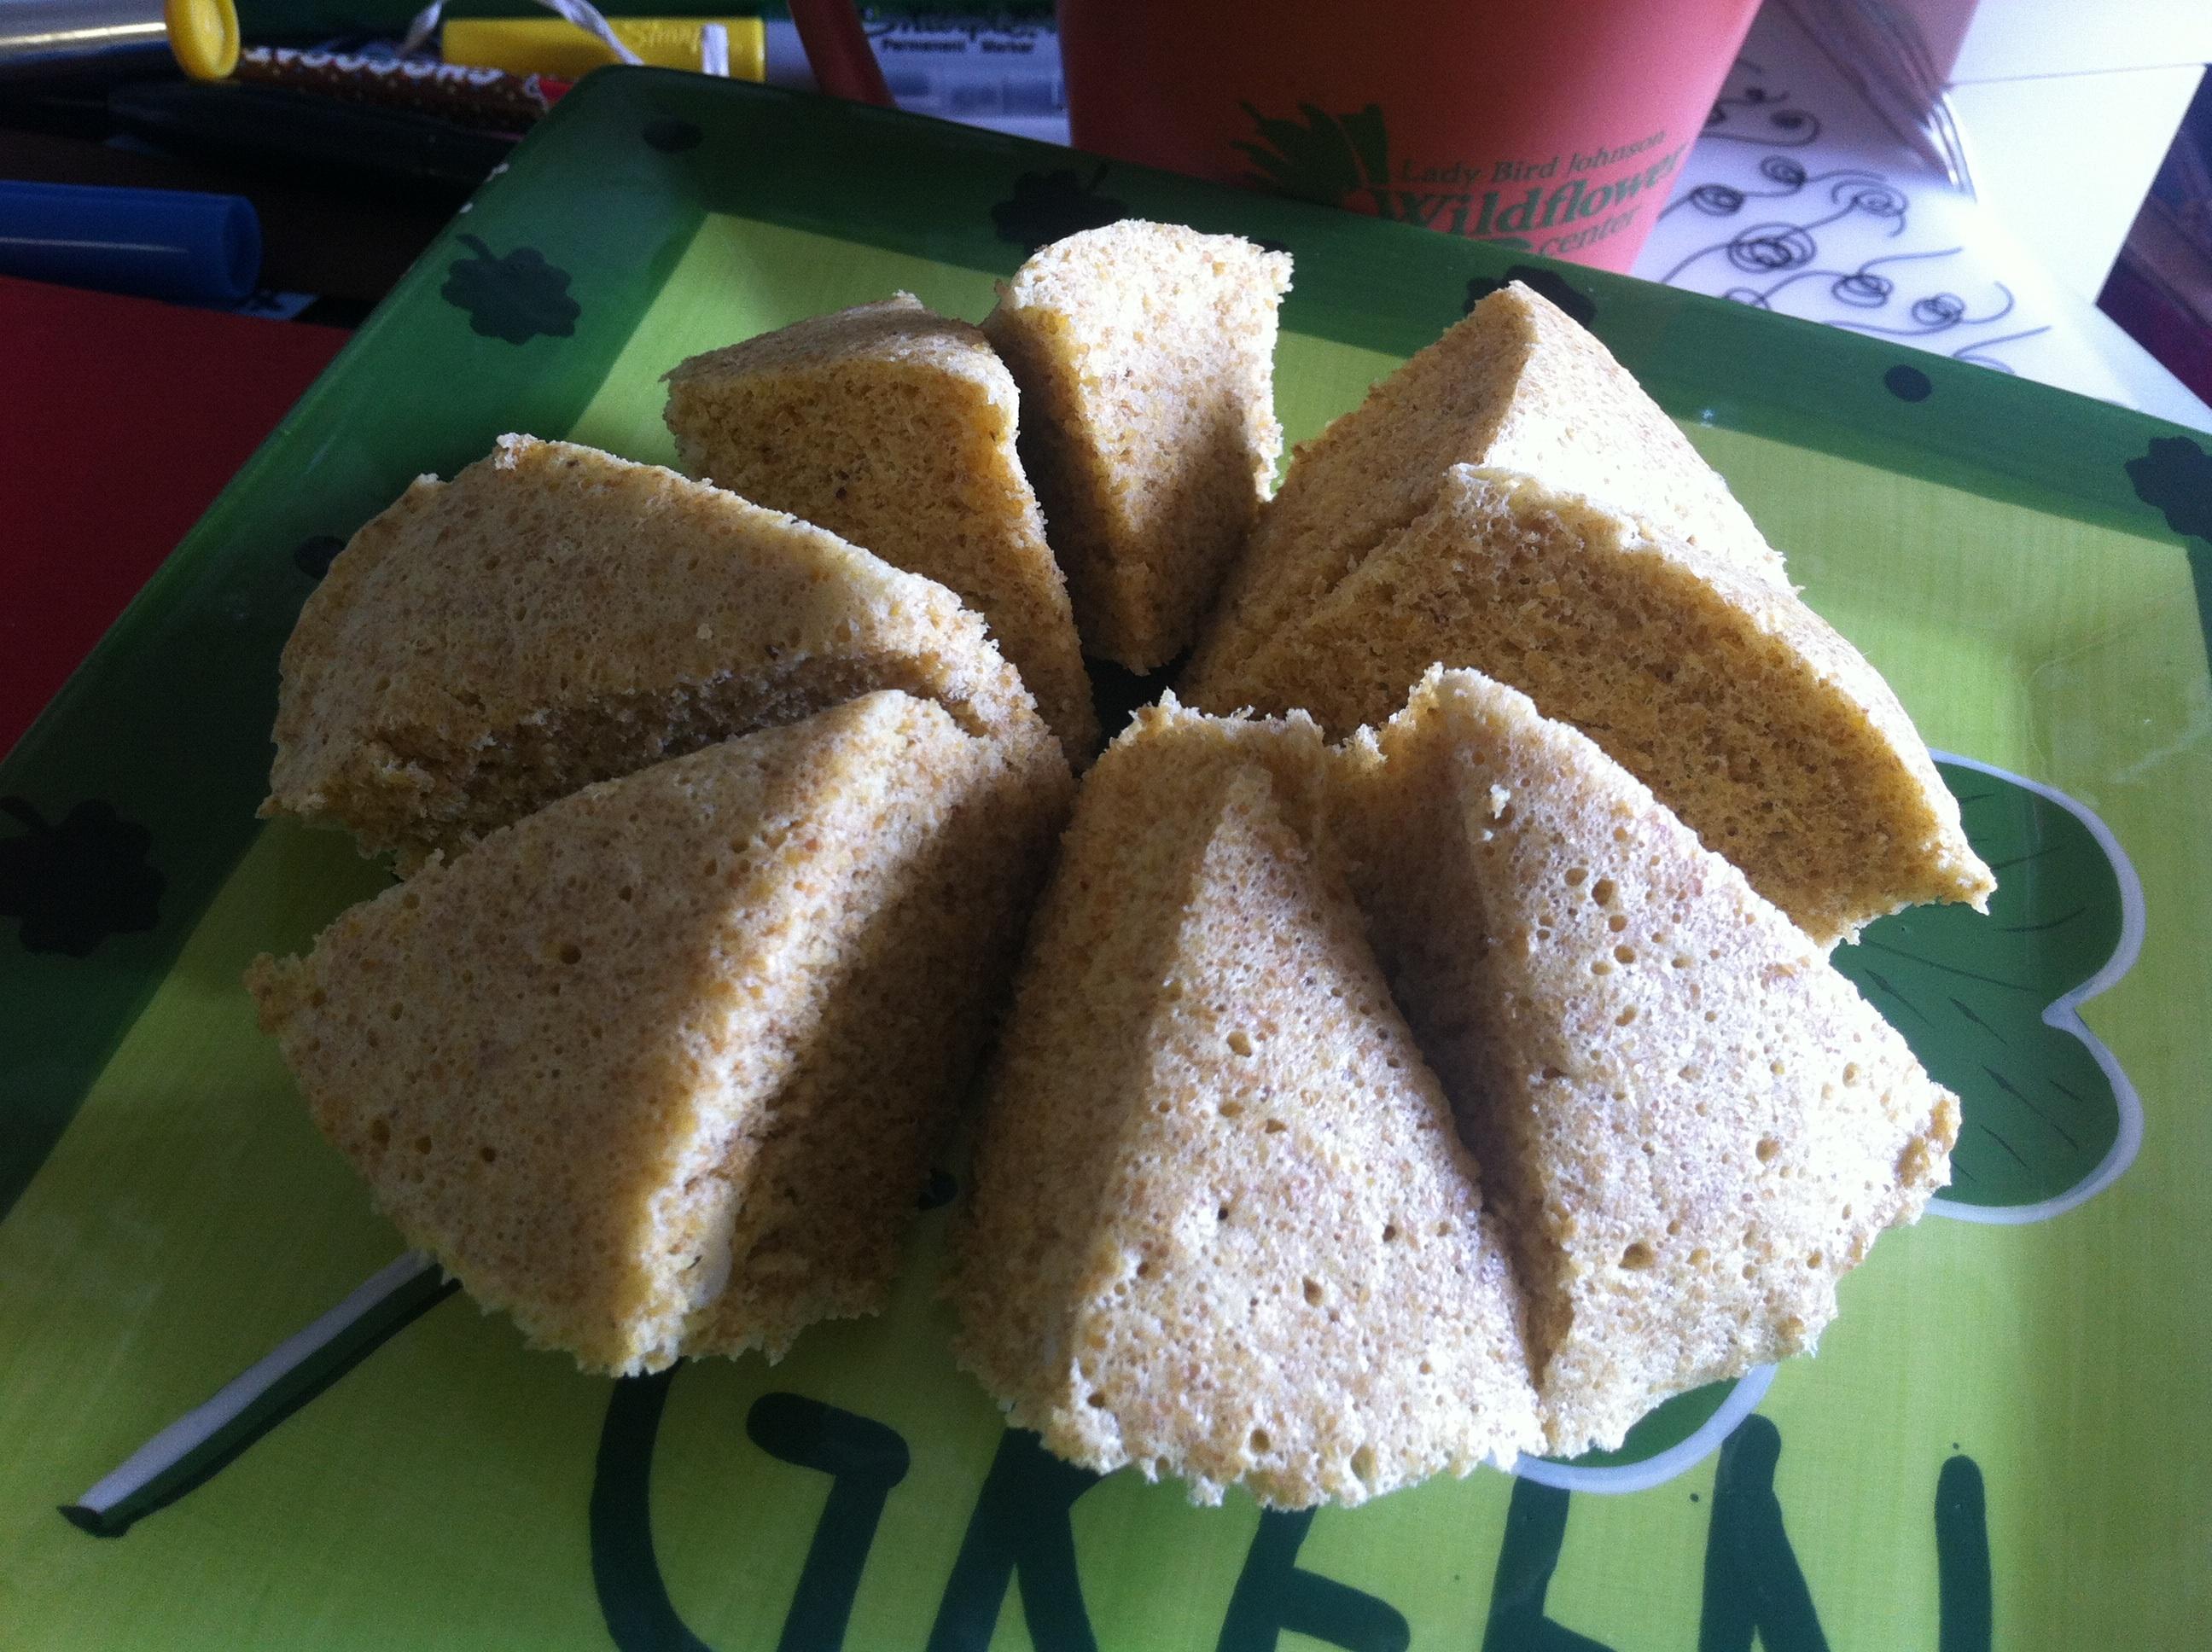 Gluten-free, low carb quick dessert cake